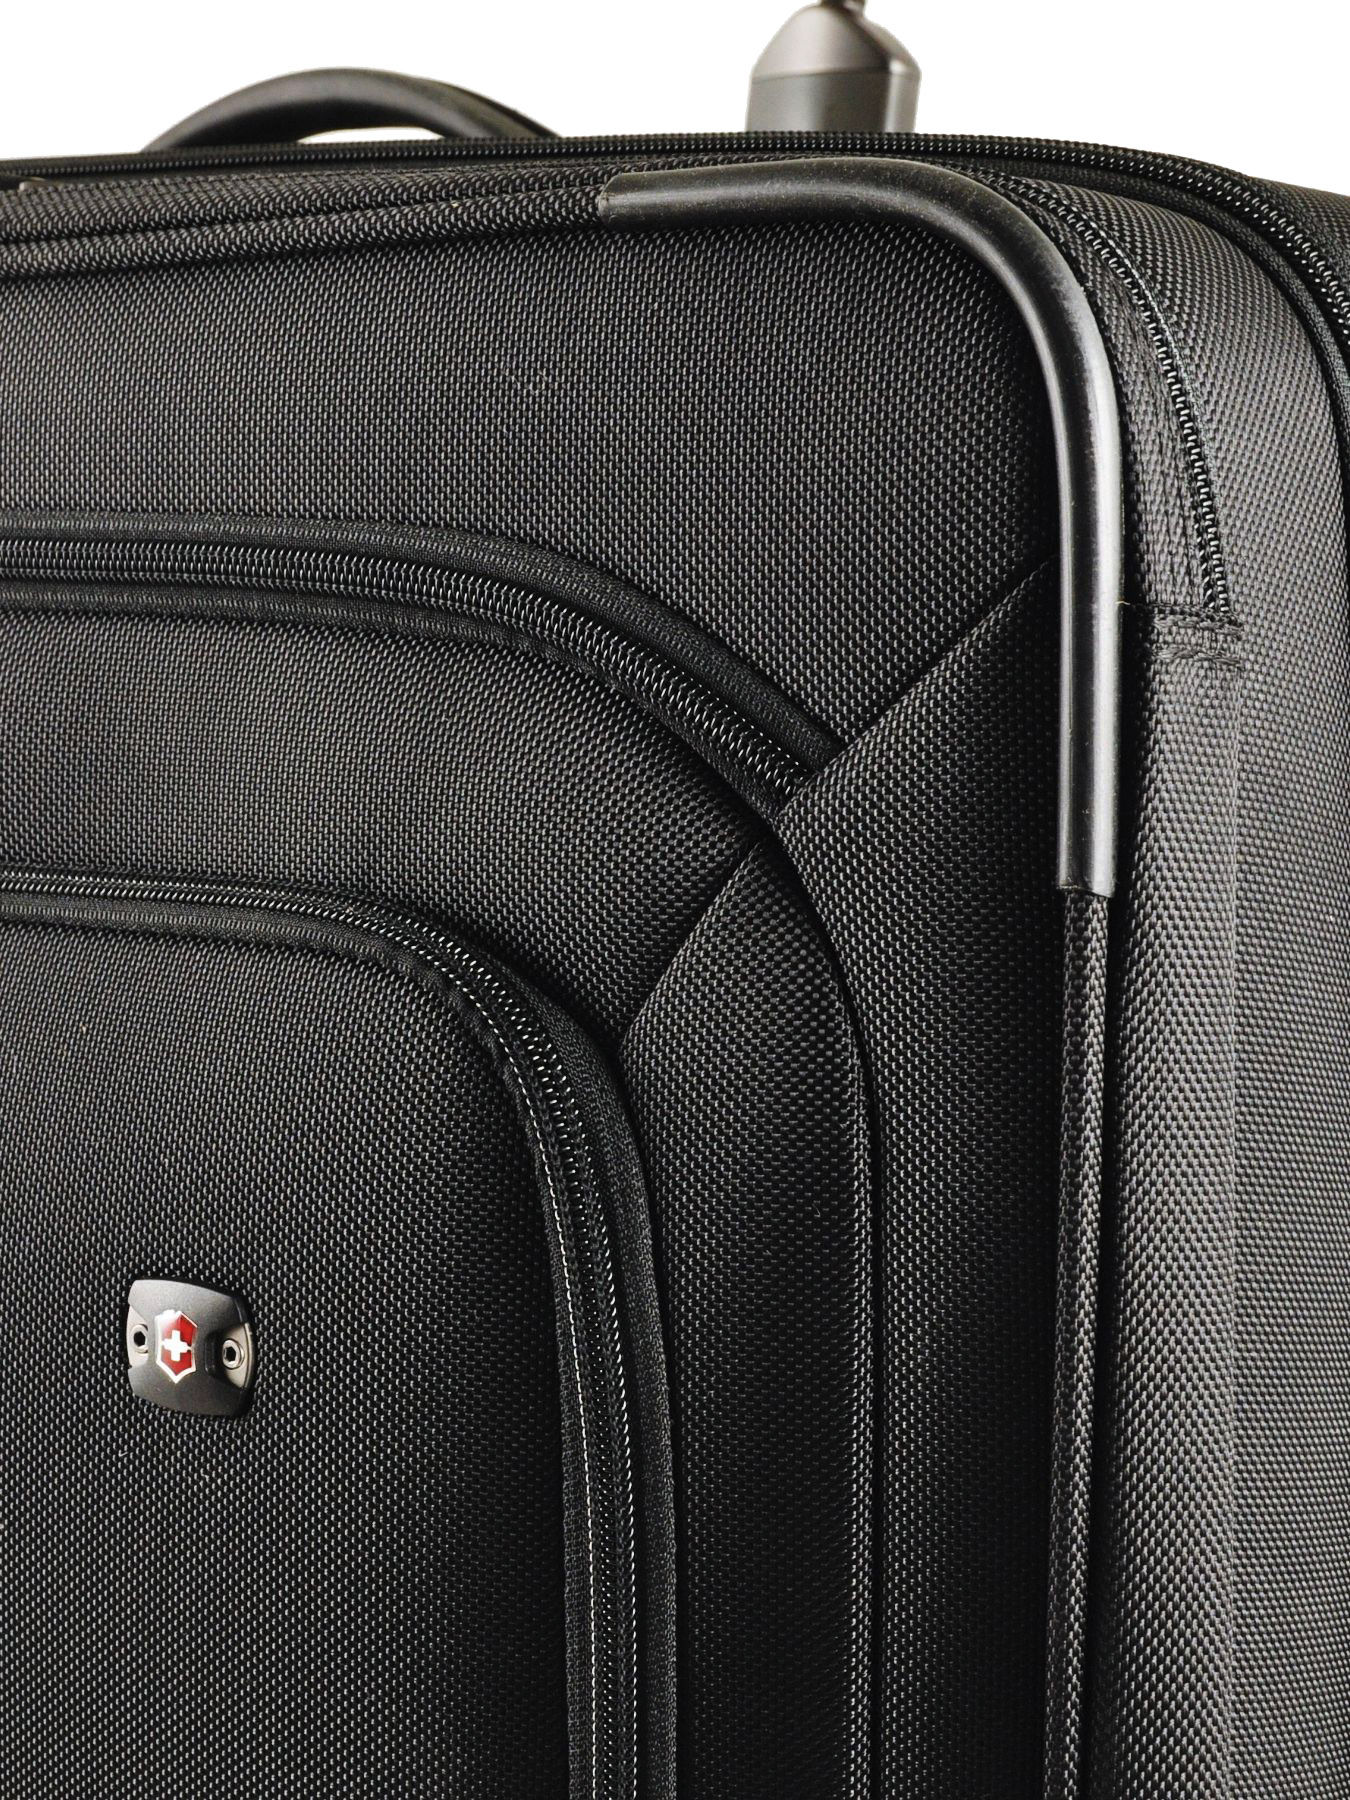 dd055496b ... Softside Luggage Werks Traveler Victorinox Black werks traveler 313003  other view 1 ...